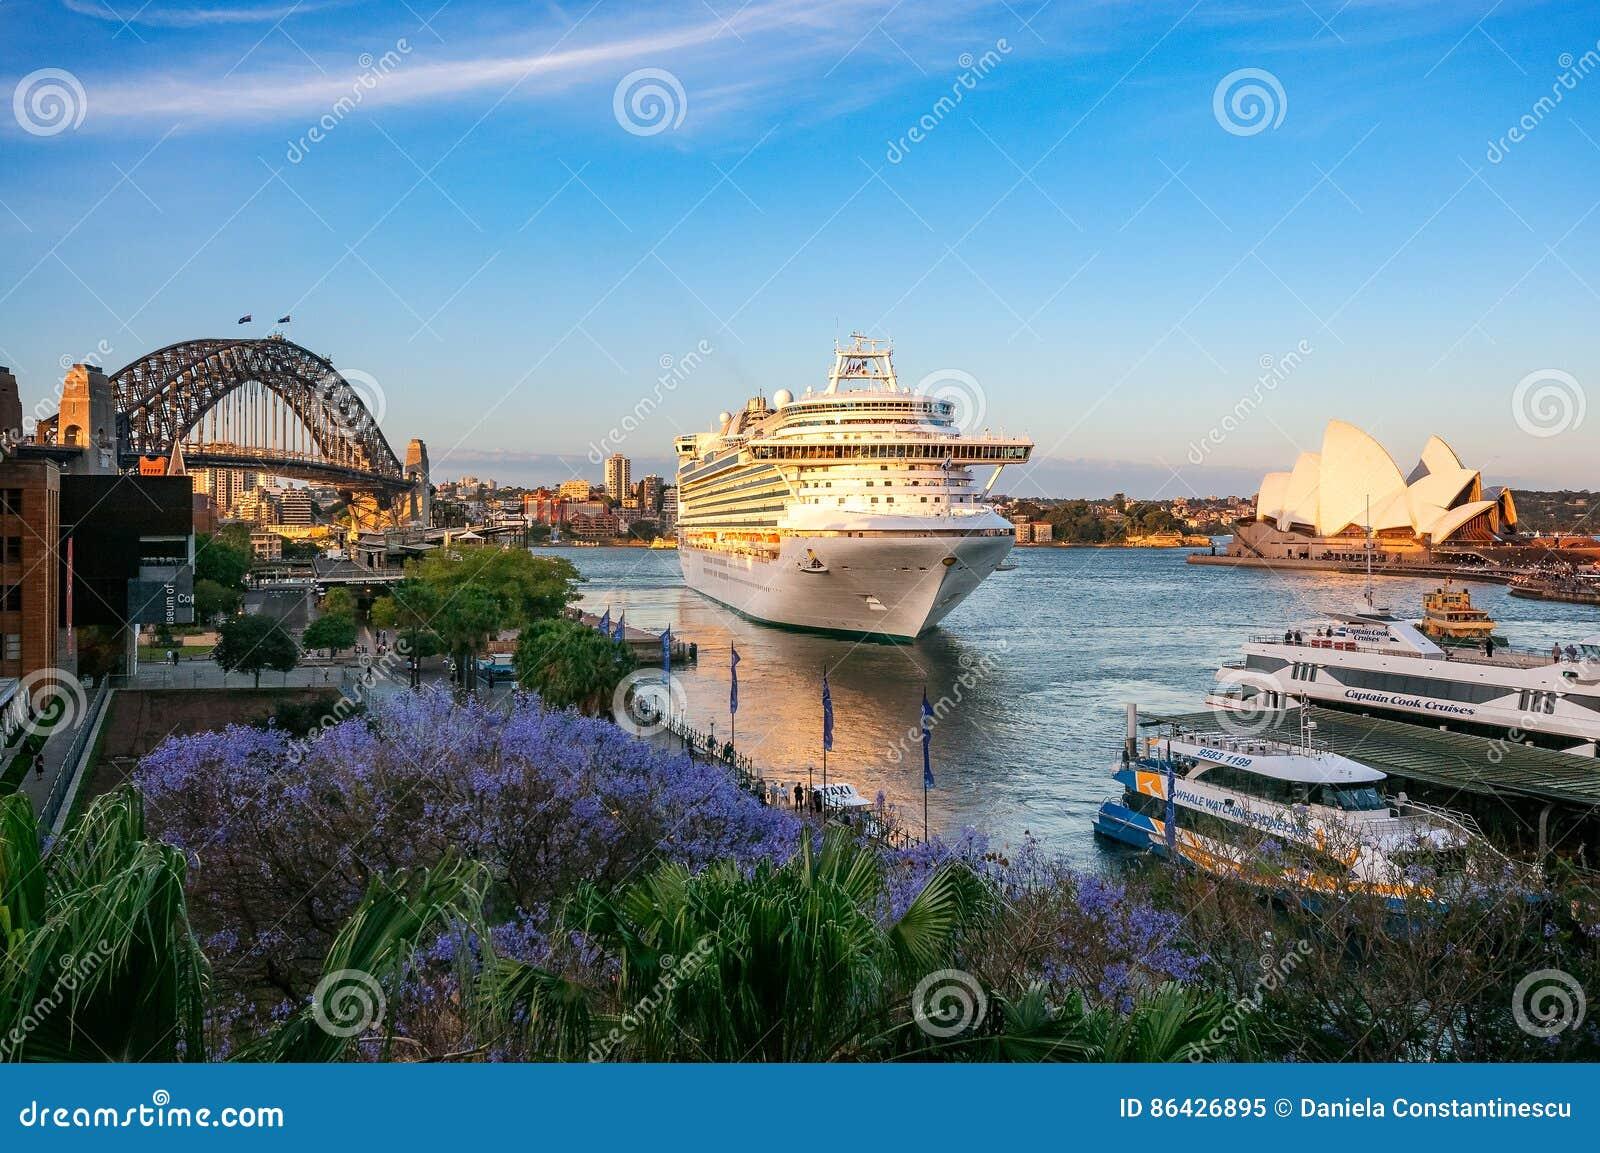 Cruise liner visiting Sydney Harbour, Australia.